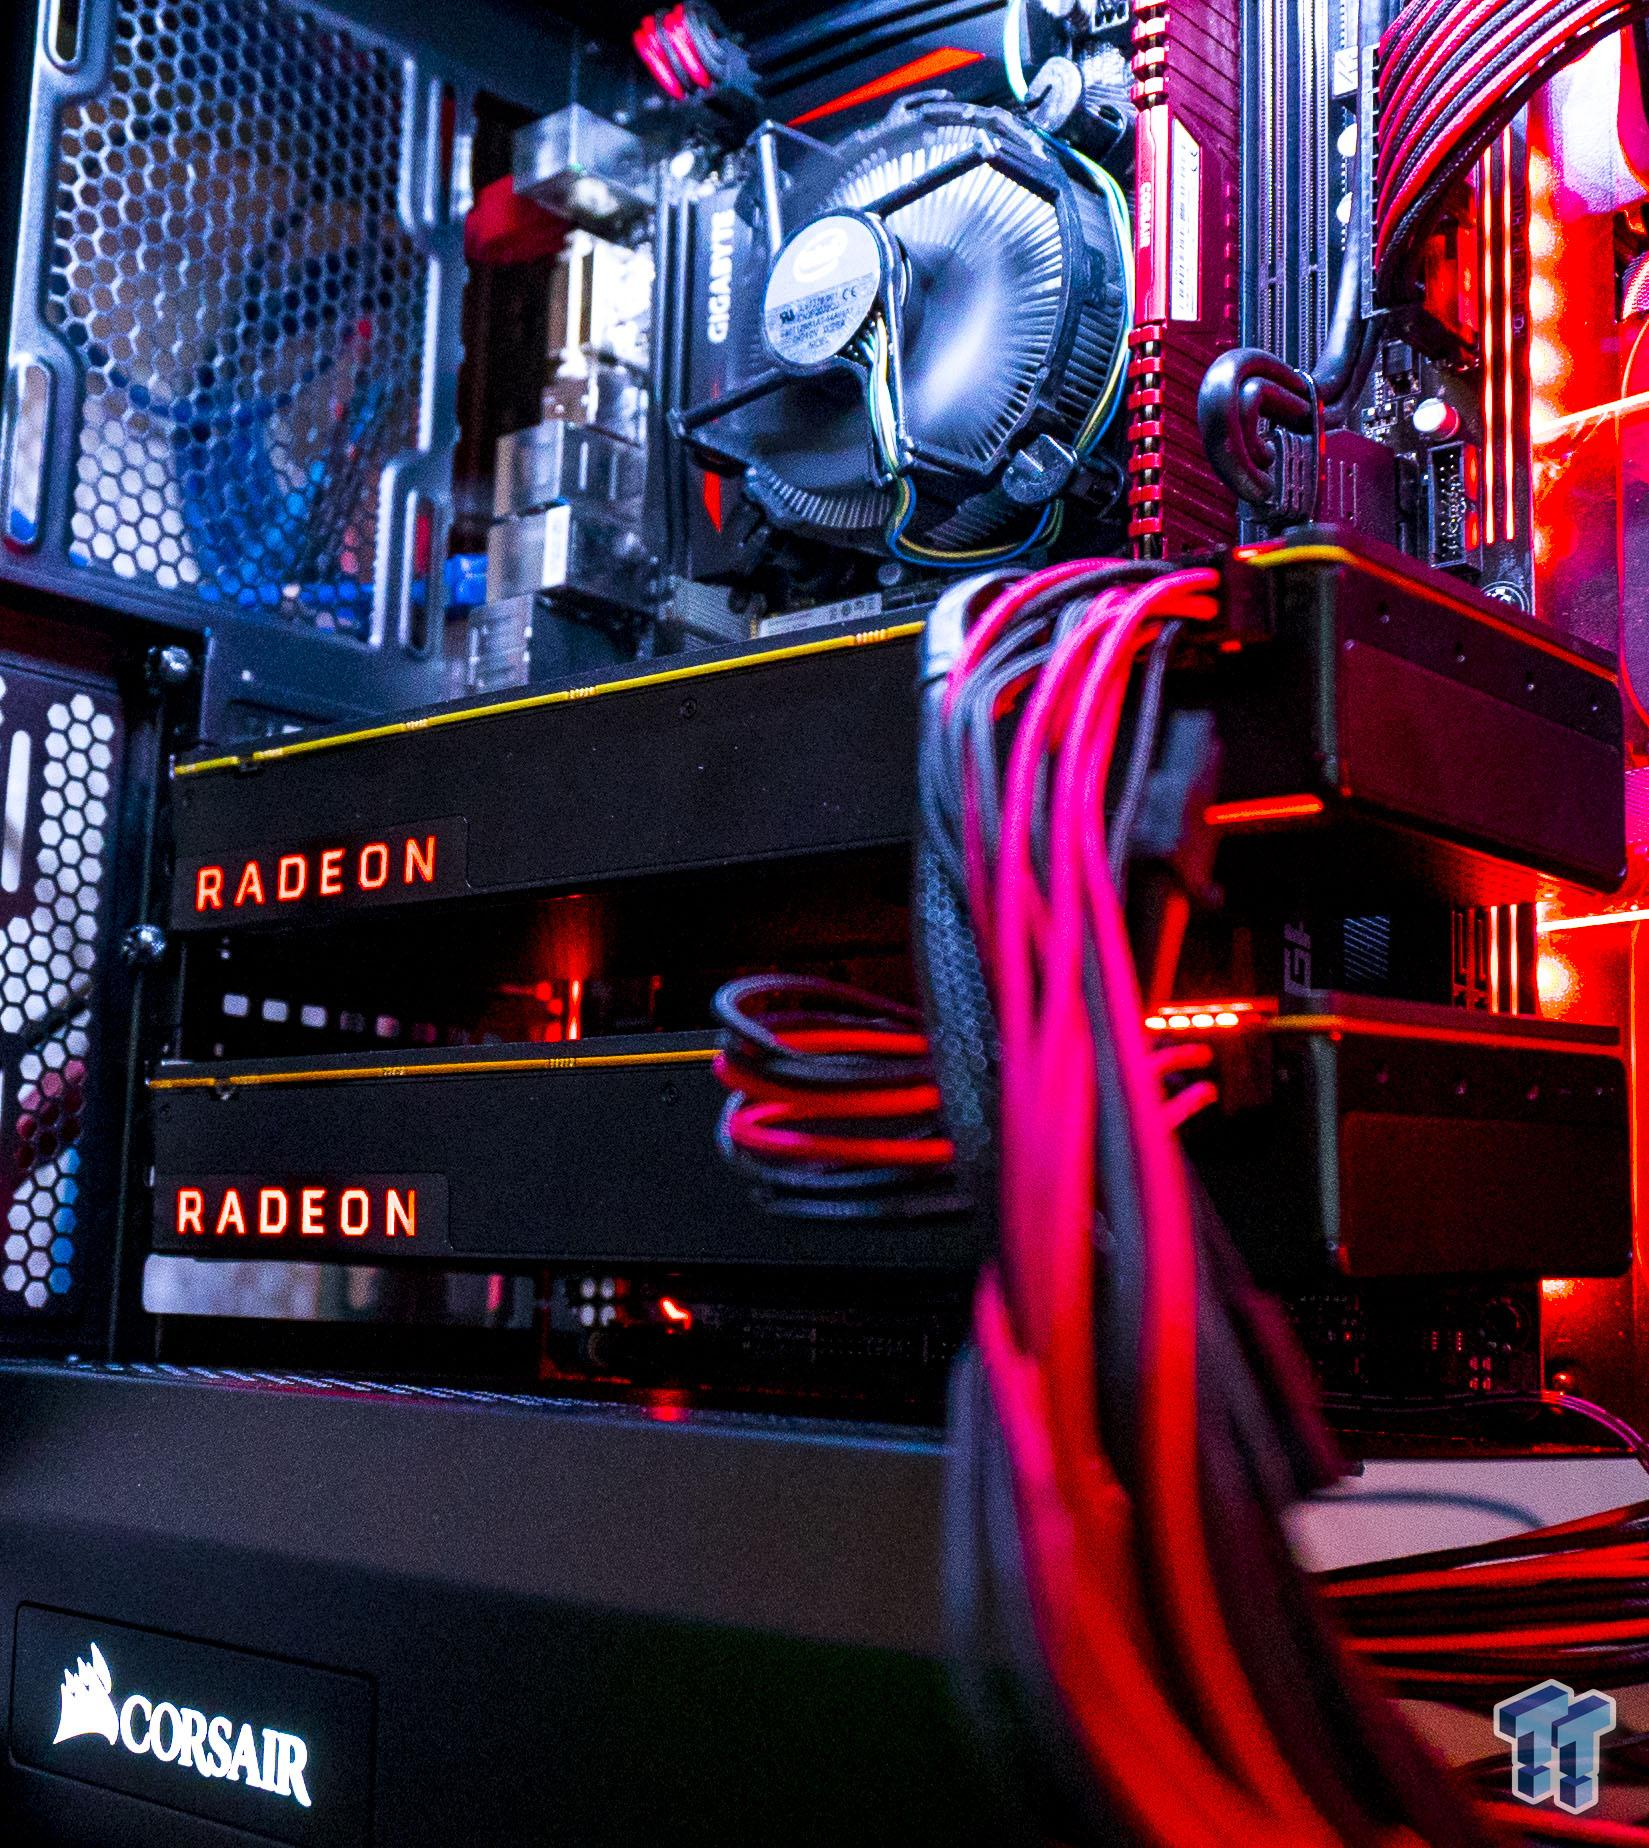 AMD Radeon RX Vega 32, RX Vega 28 rumored to be coming